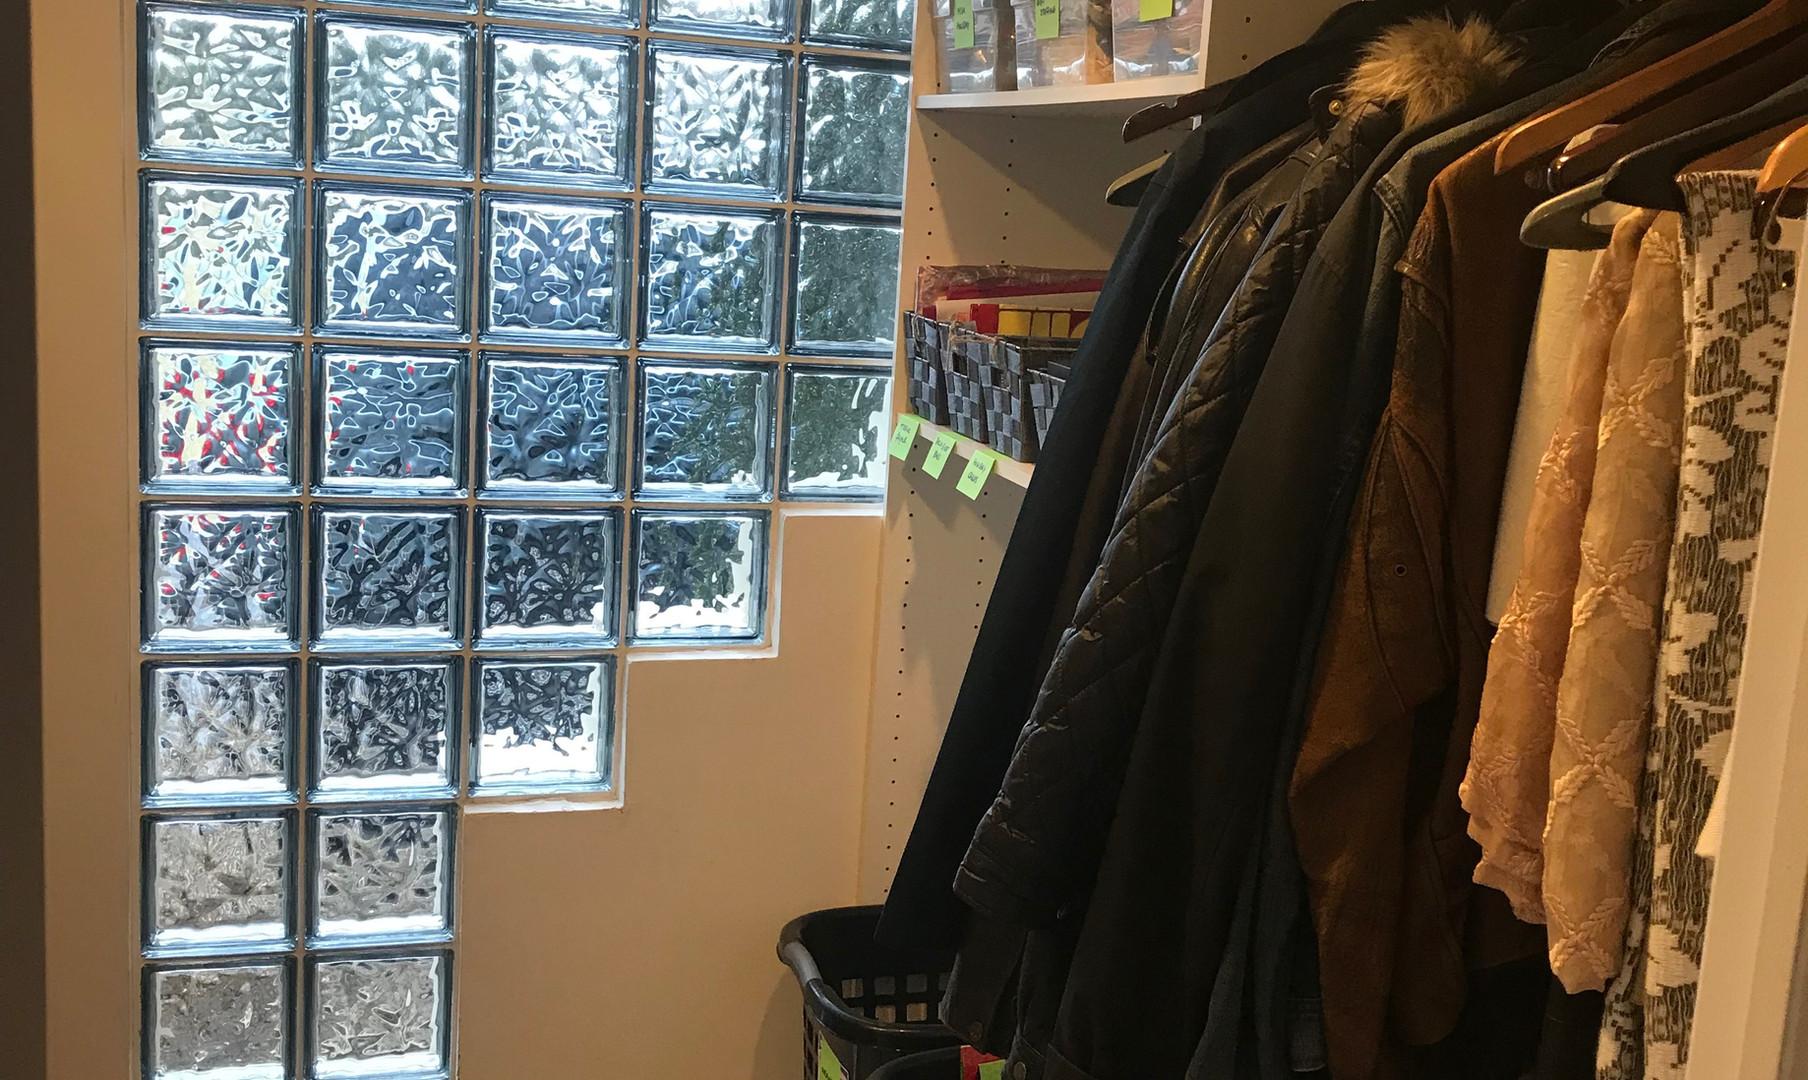 Utility Closet - After